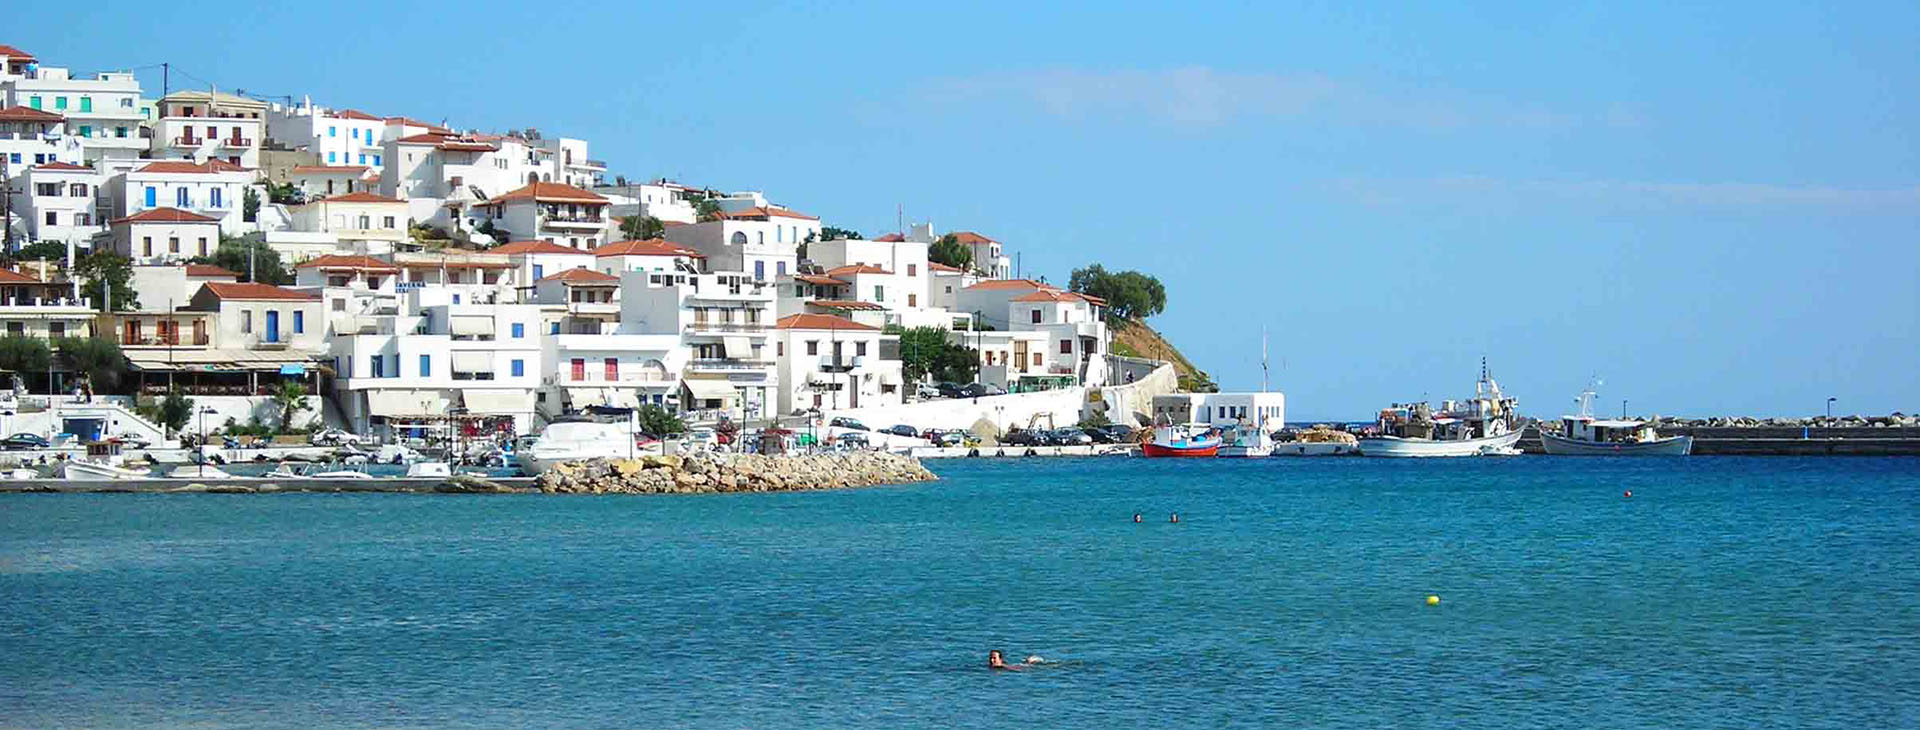 Chora, Andros island